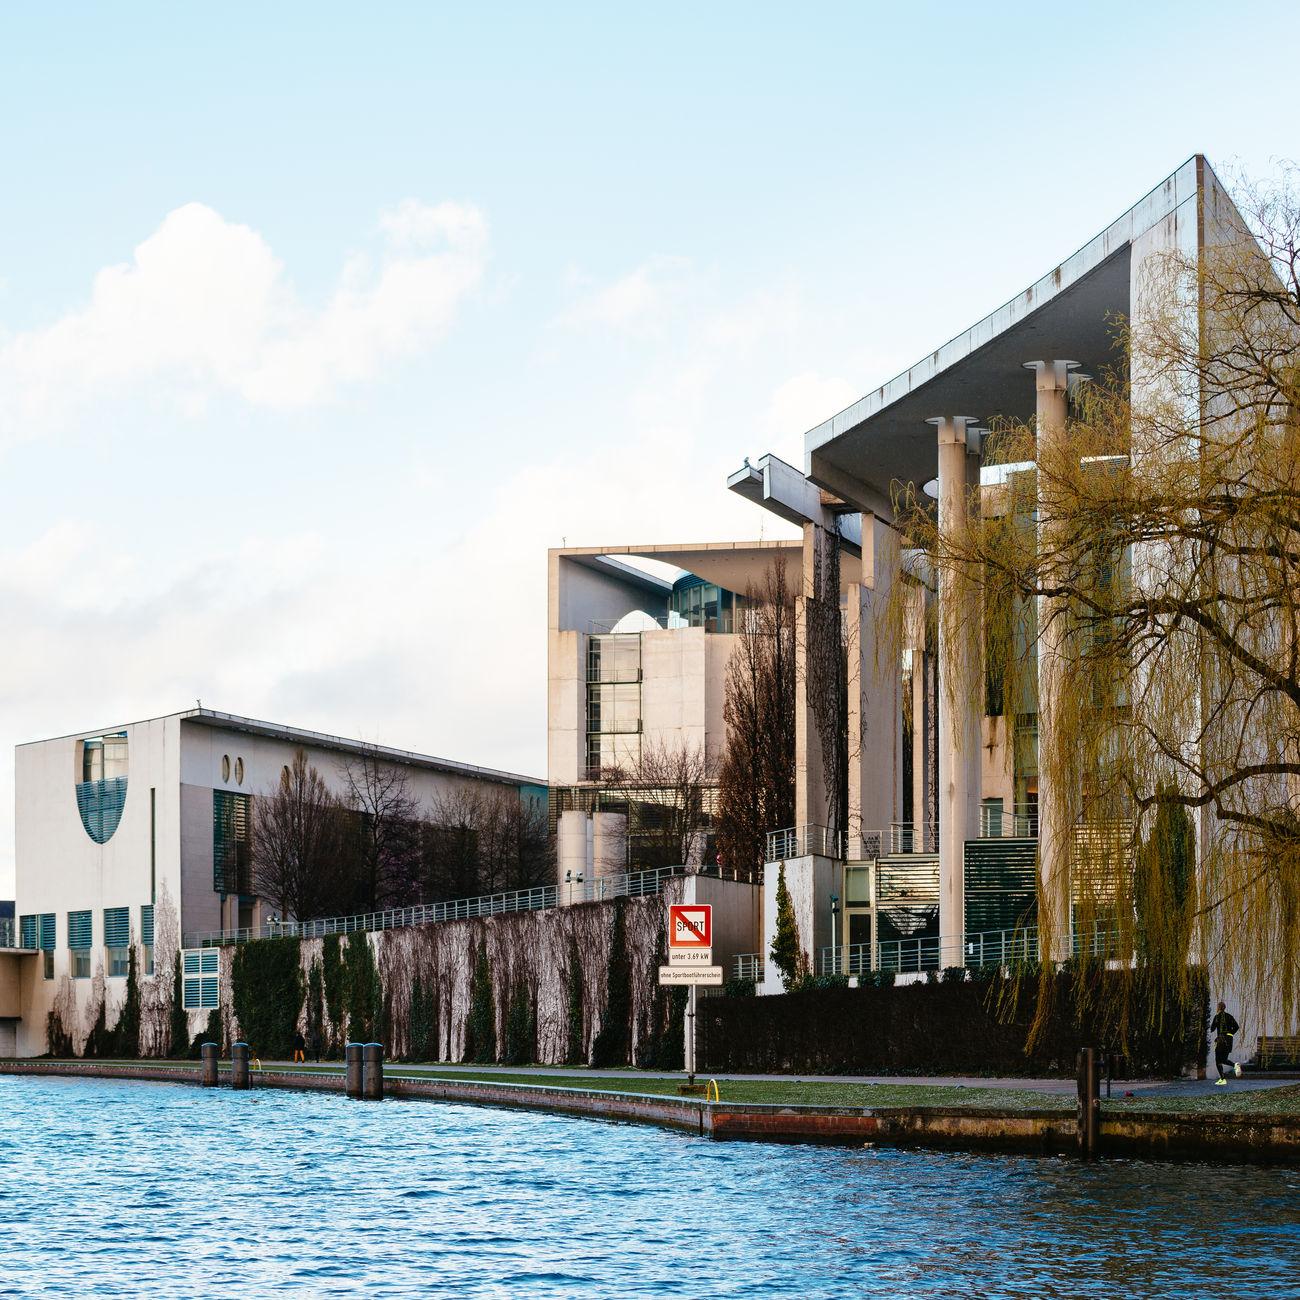 Architecture Building City Kanzleramt Berlin River Spree Water Waterfront